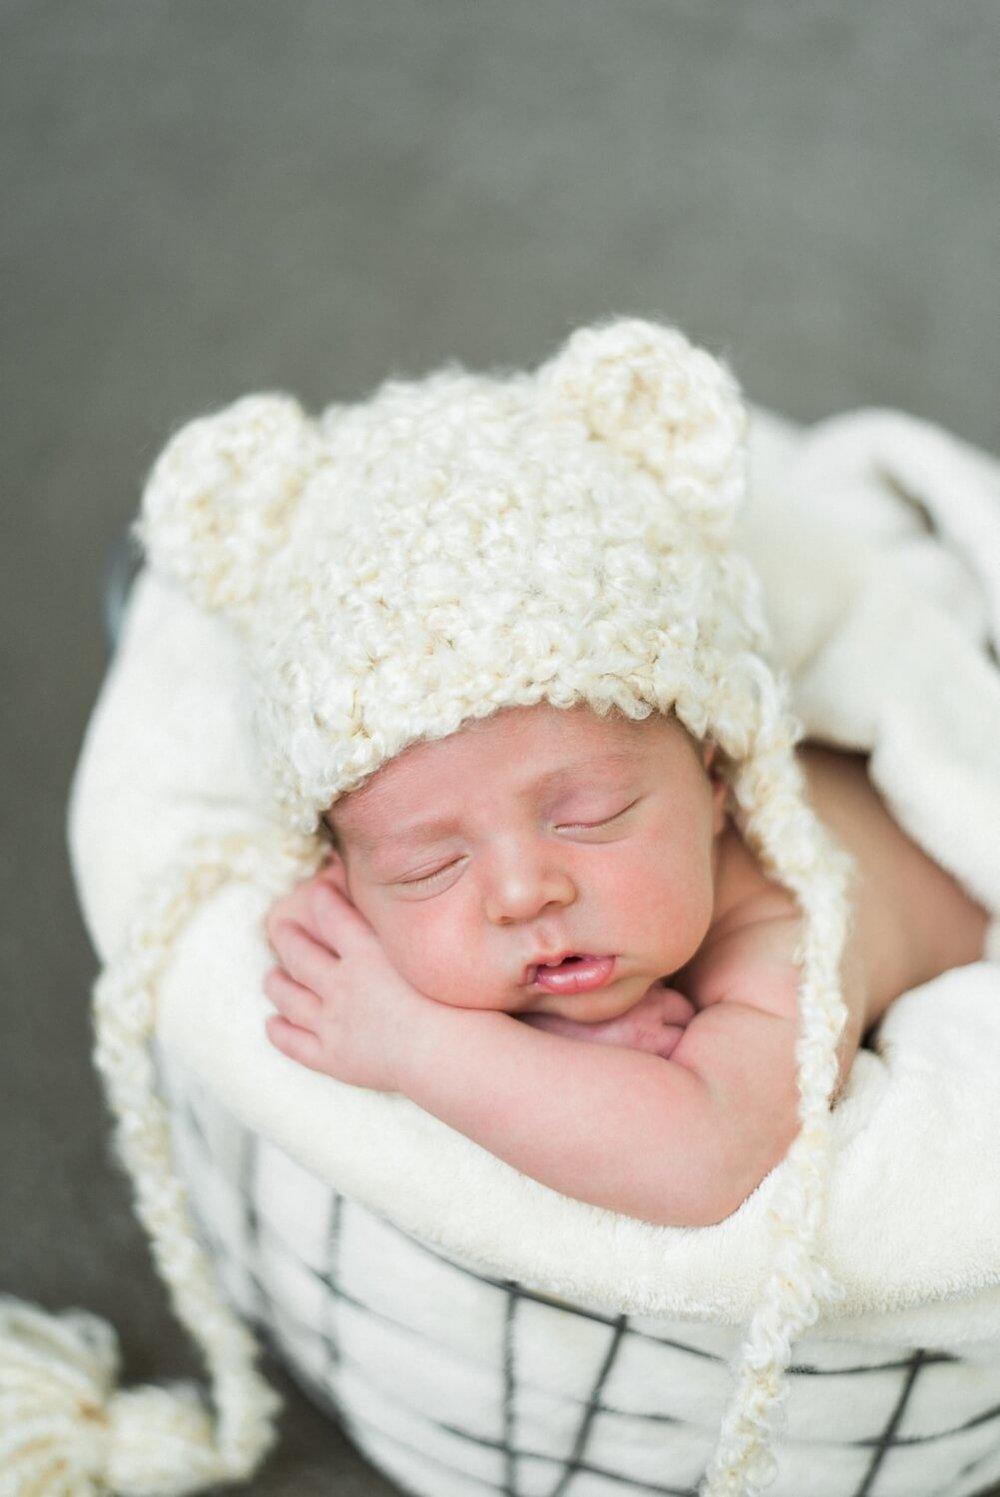 portland-oregon-newborn-photographer-sleeping-baby-boy-bear-ear-knit-hat-with-tassles-shelley-marie-photography-8.jpg